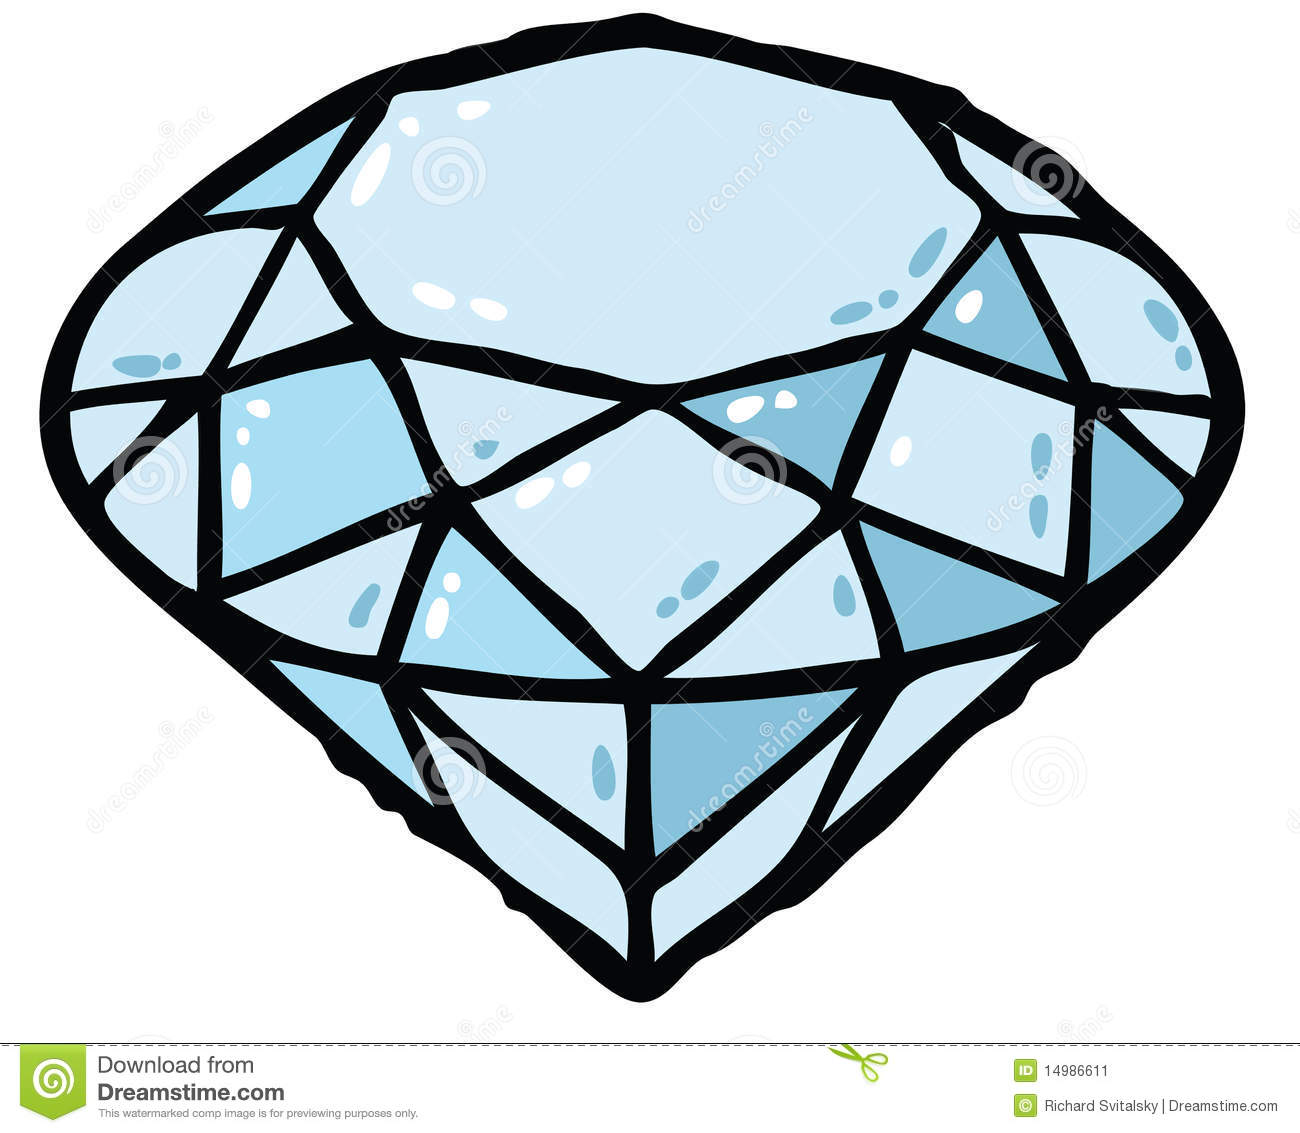 Diamond color. Vector clipart panda free